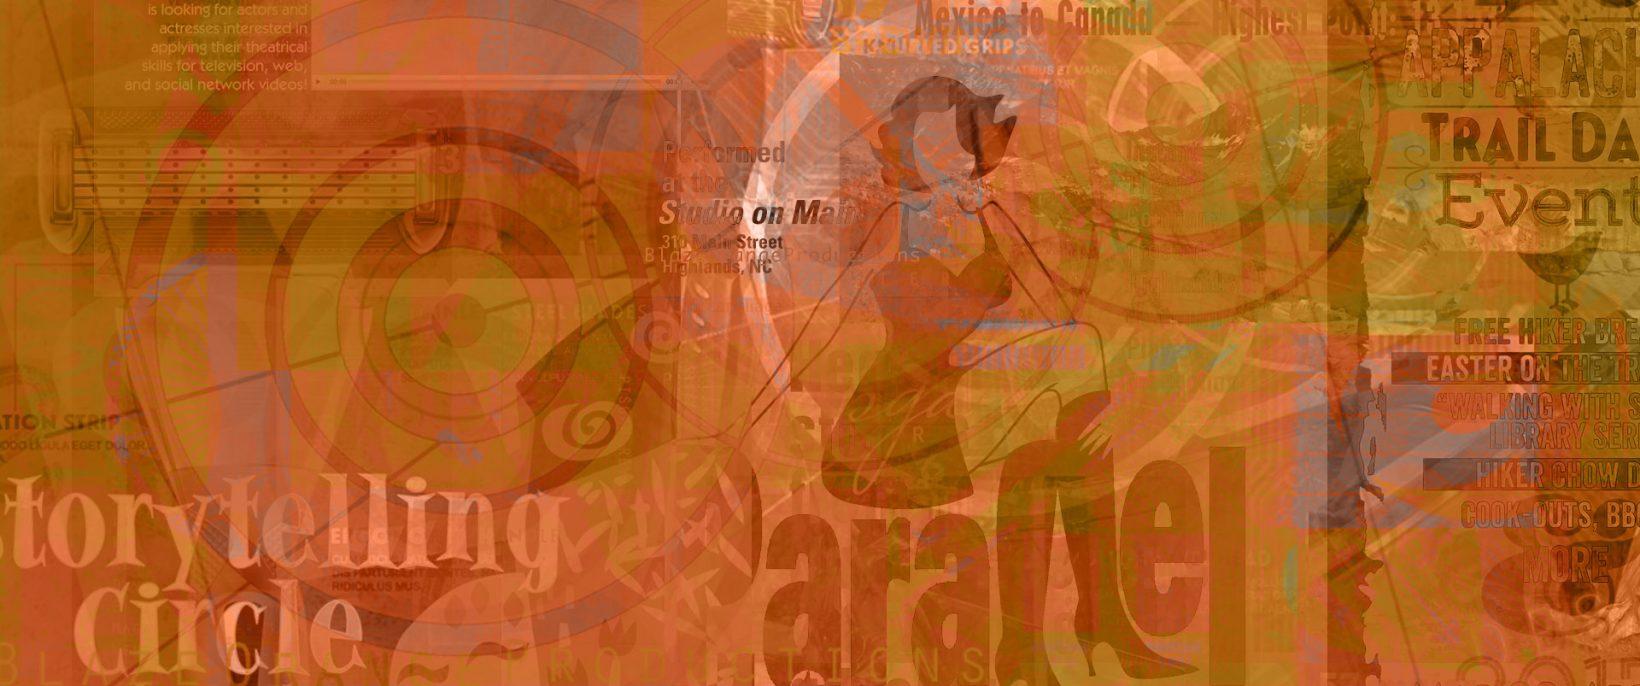 Ads/Promos_Banner Montage, by Lonnie Busch, Crater Line Design